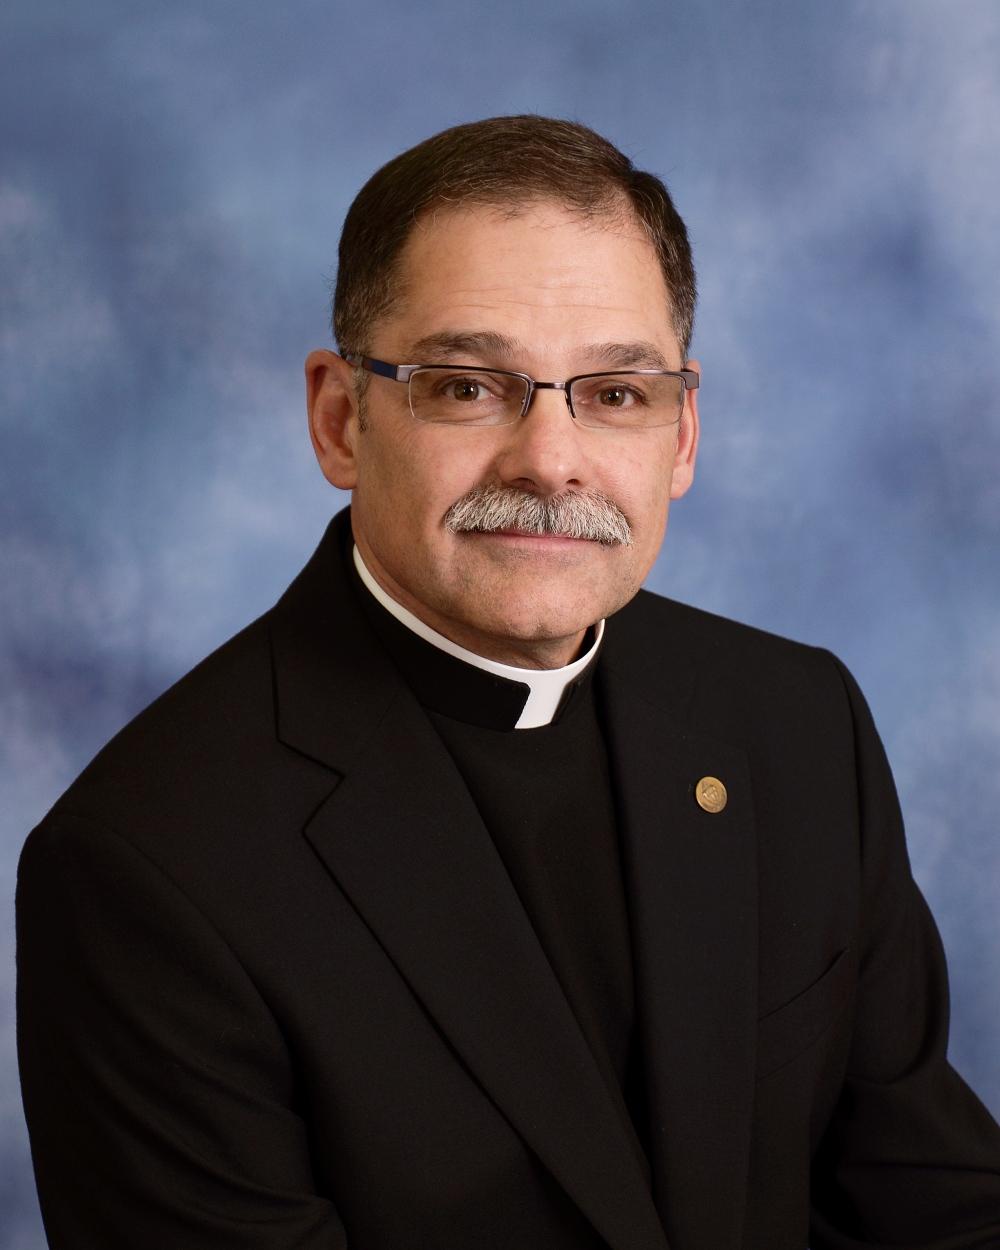 Fr. Rick Courier